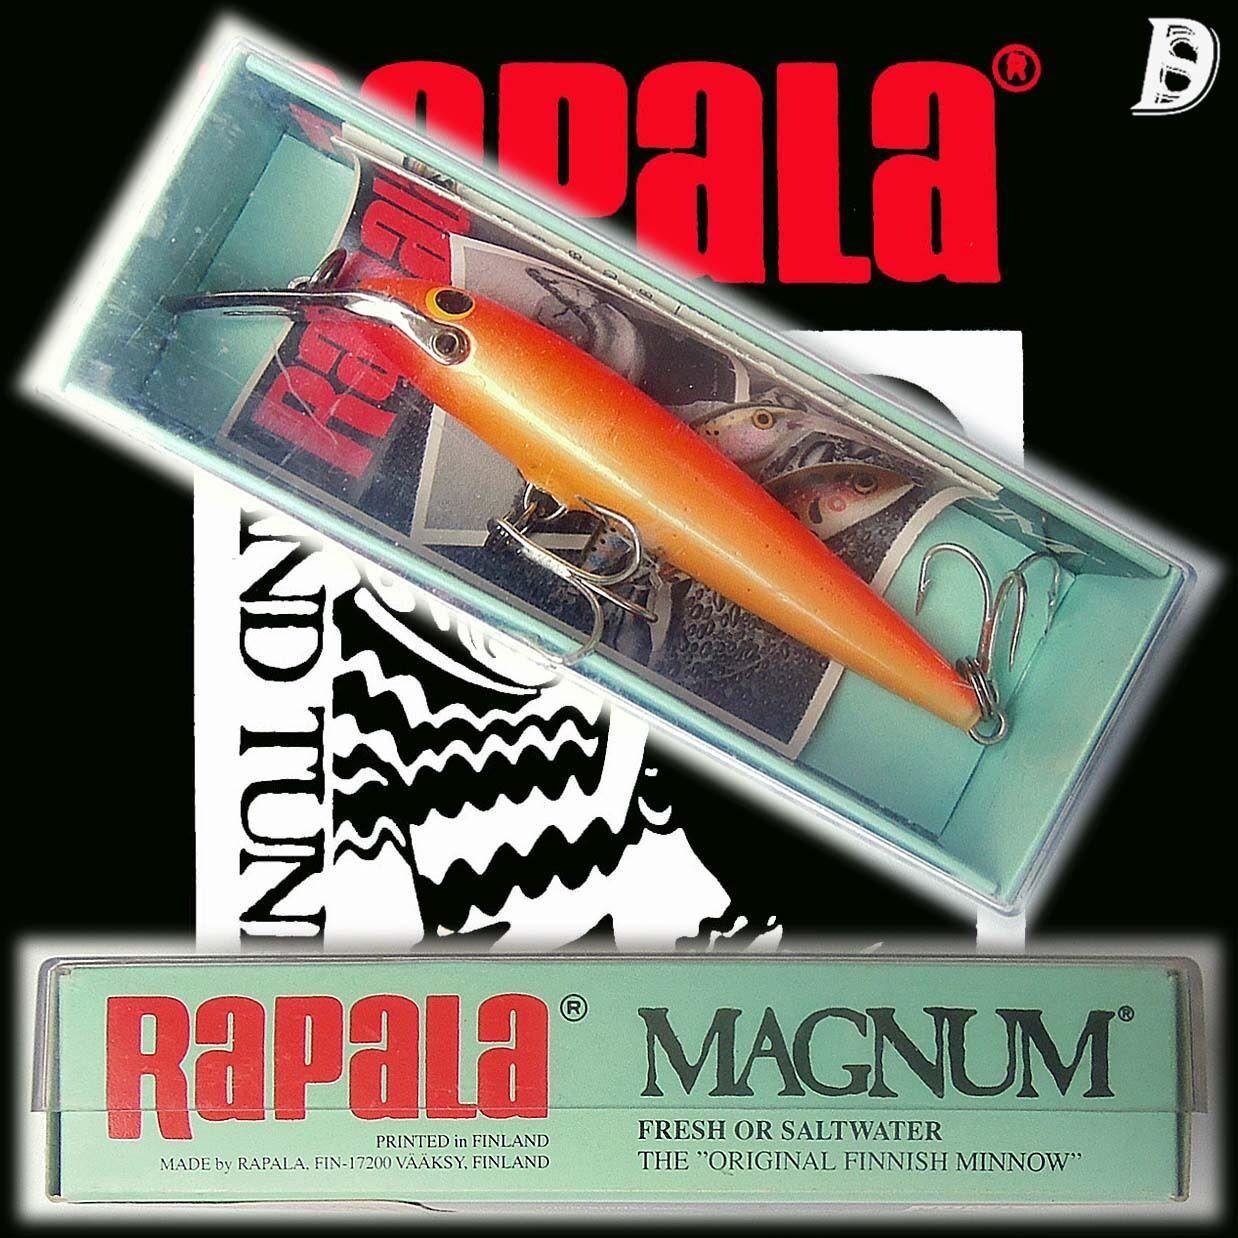 Vintage Rapala Magnum Countdown 8cm GFR Neu in Box Finnland, extrem selten